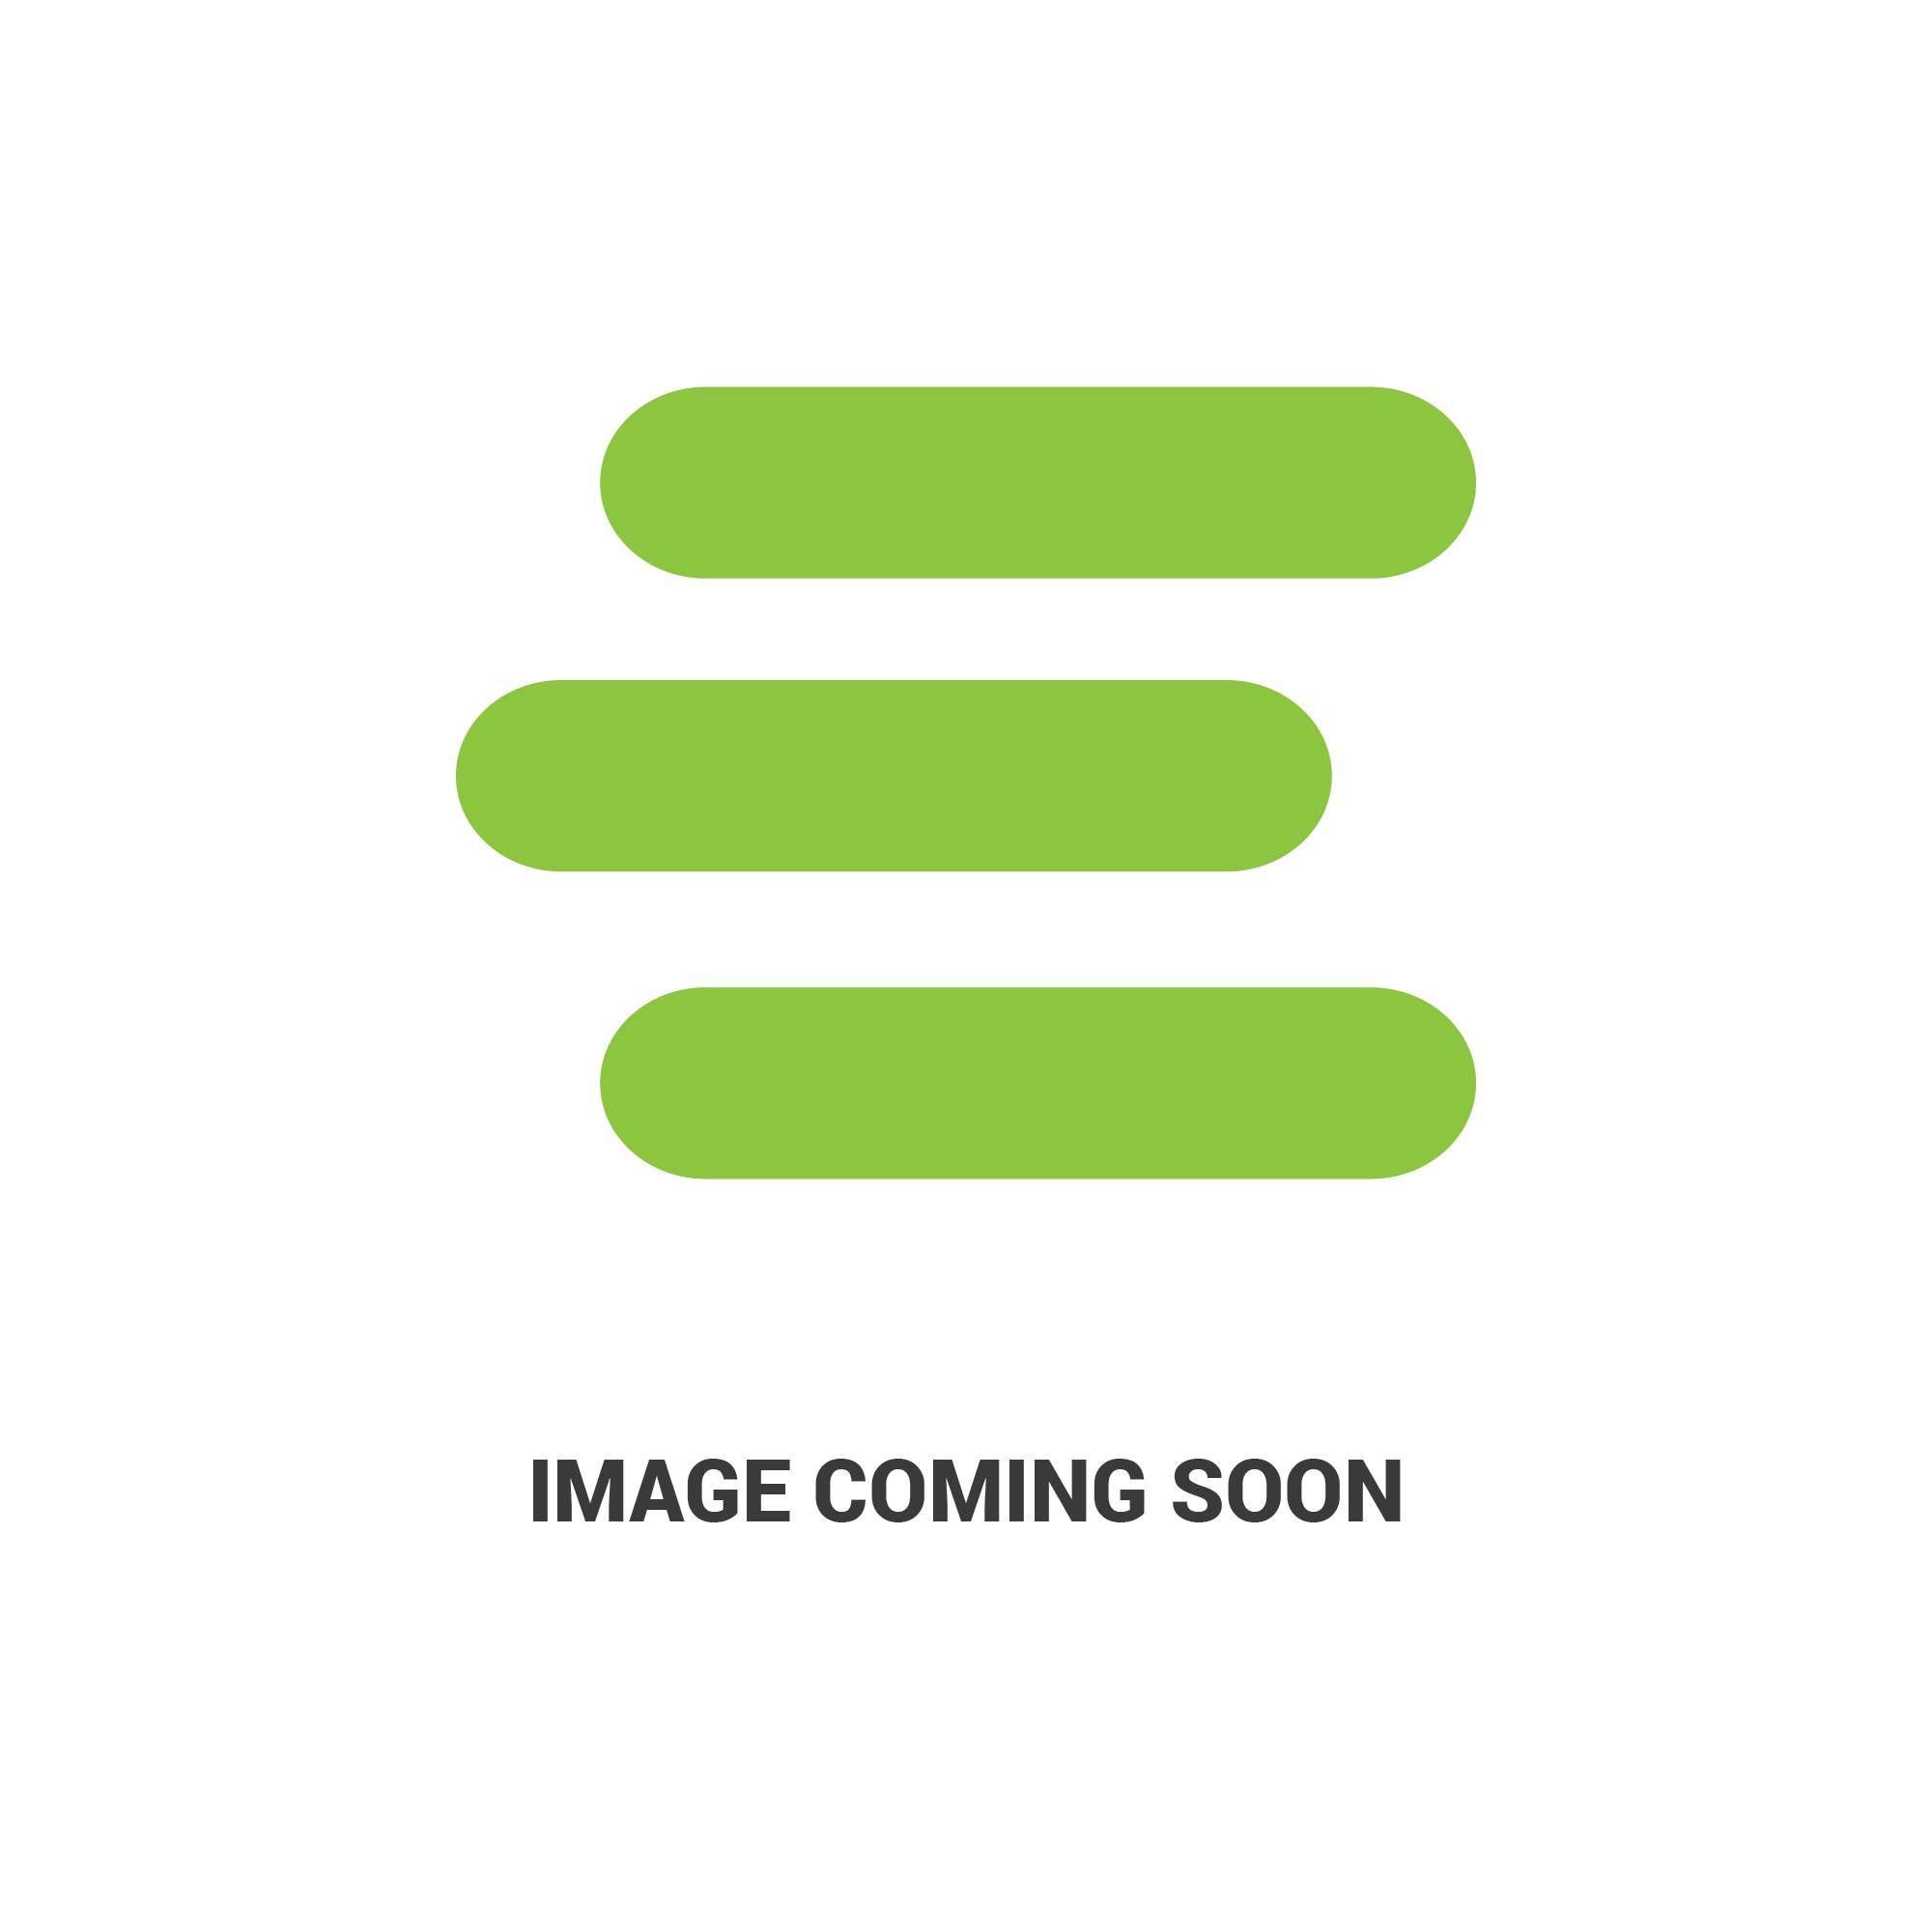 E-09500-16287edit 2.jpg